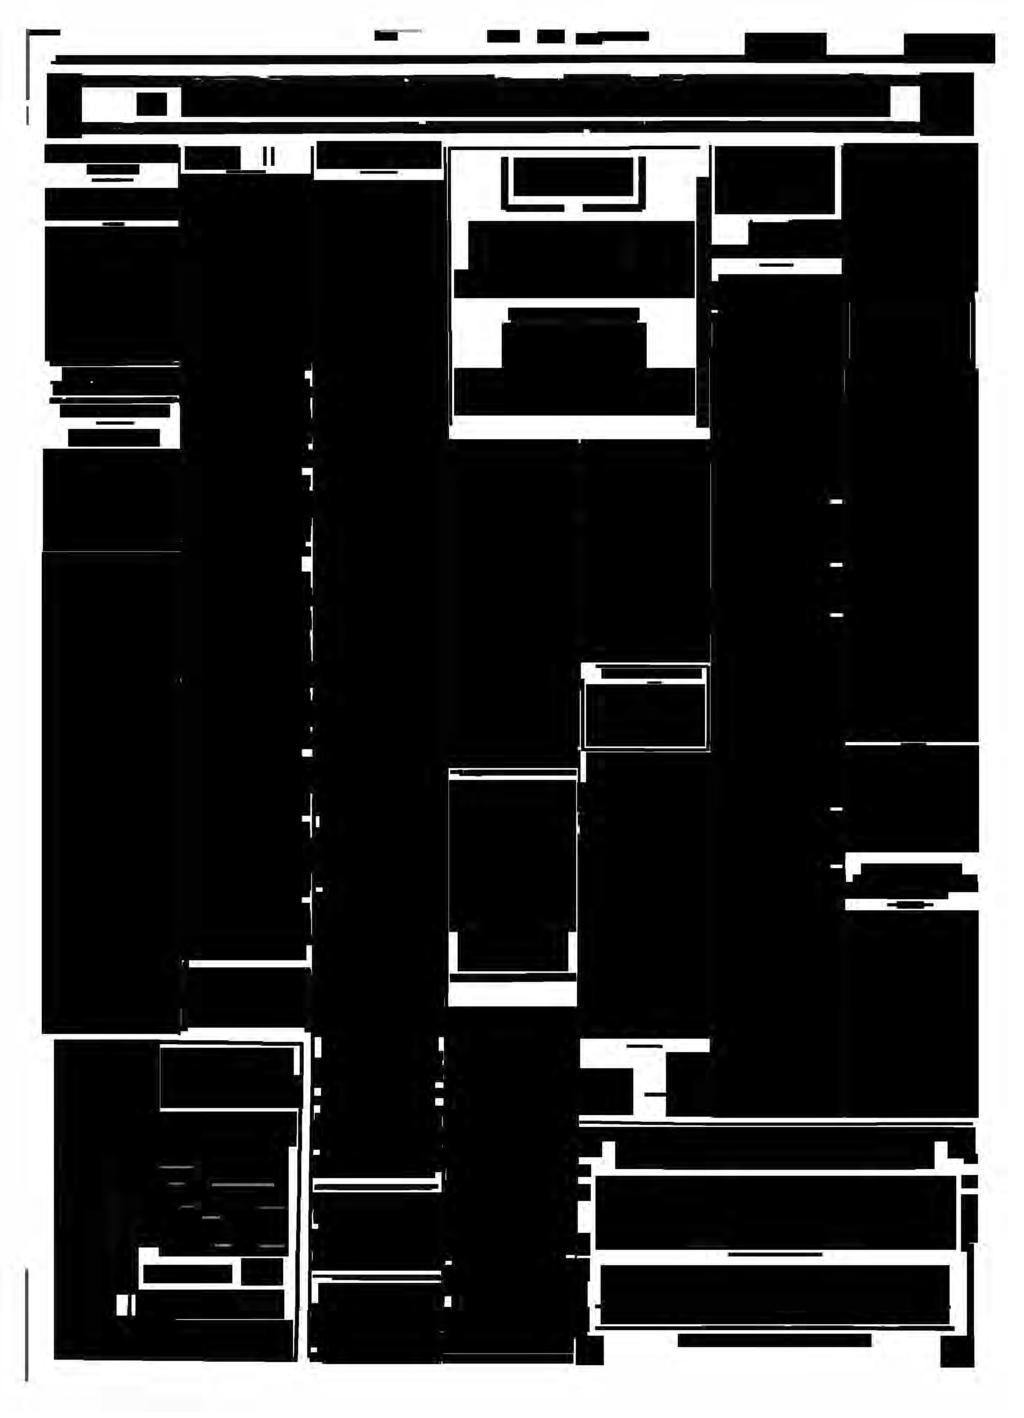 V.'j'. S'k» Tg Mordkivt Smodi 3 Juin. Renai3T10N Et ... concernant Dimension Piscine Non Imposable